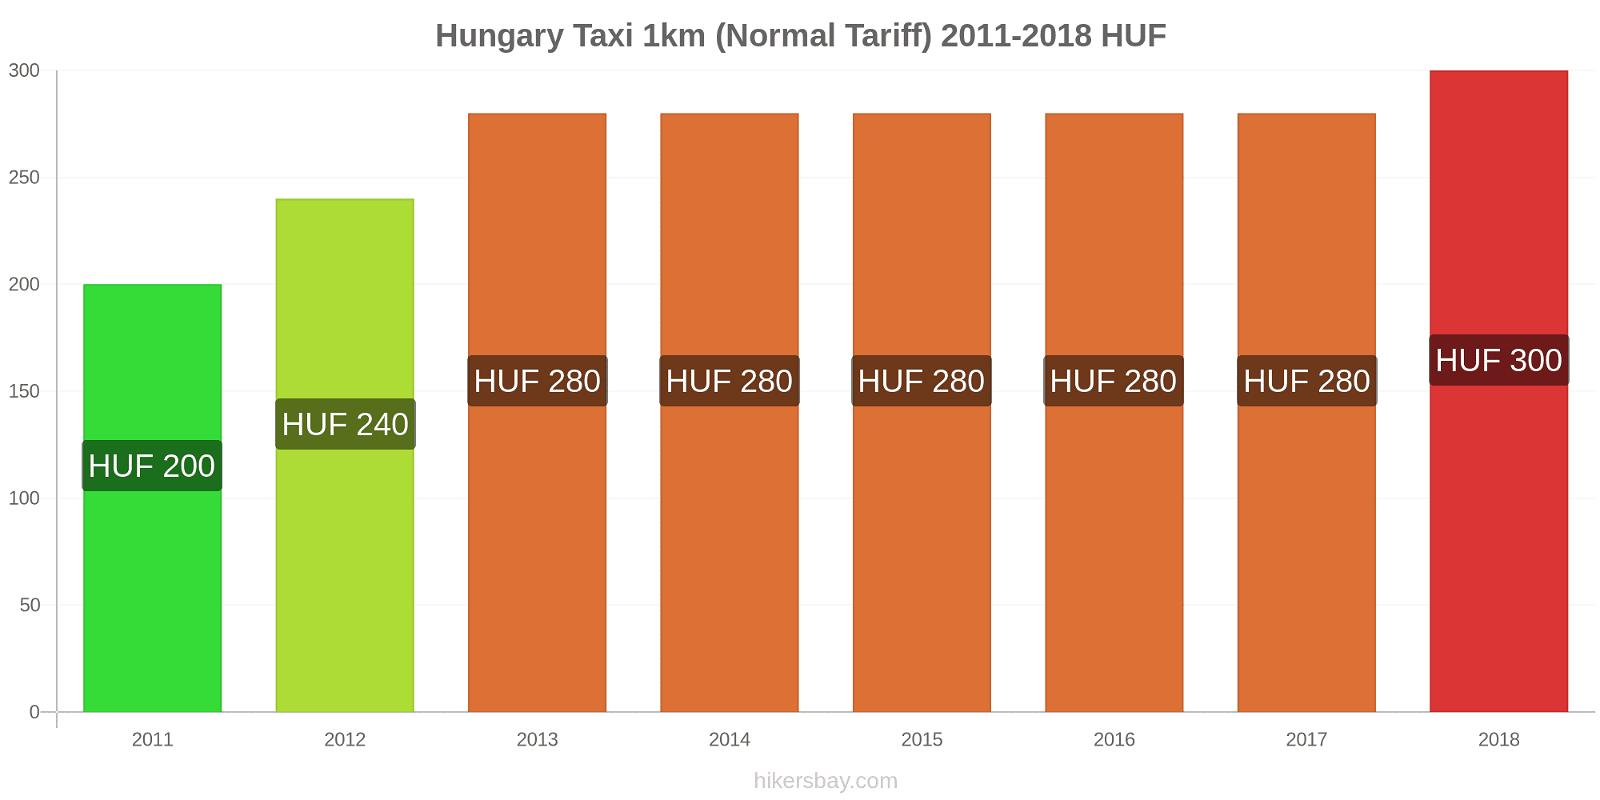 Hungary price changes Taxi 1km (Normal Tariff) hikersbay.com